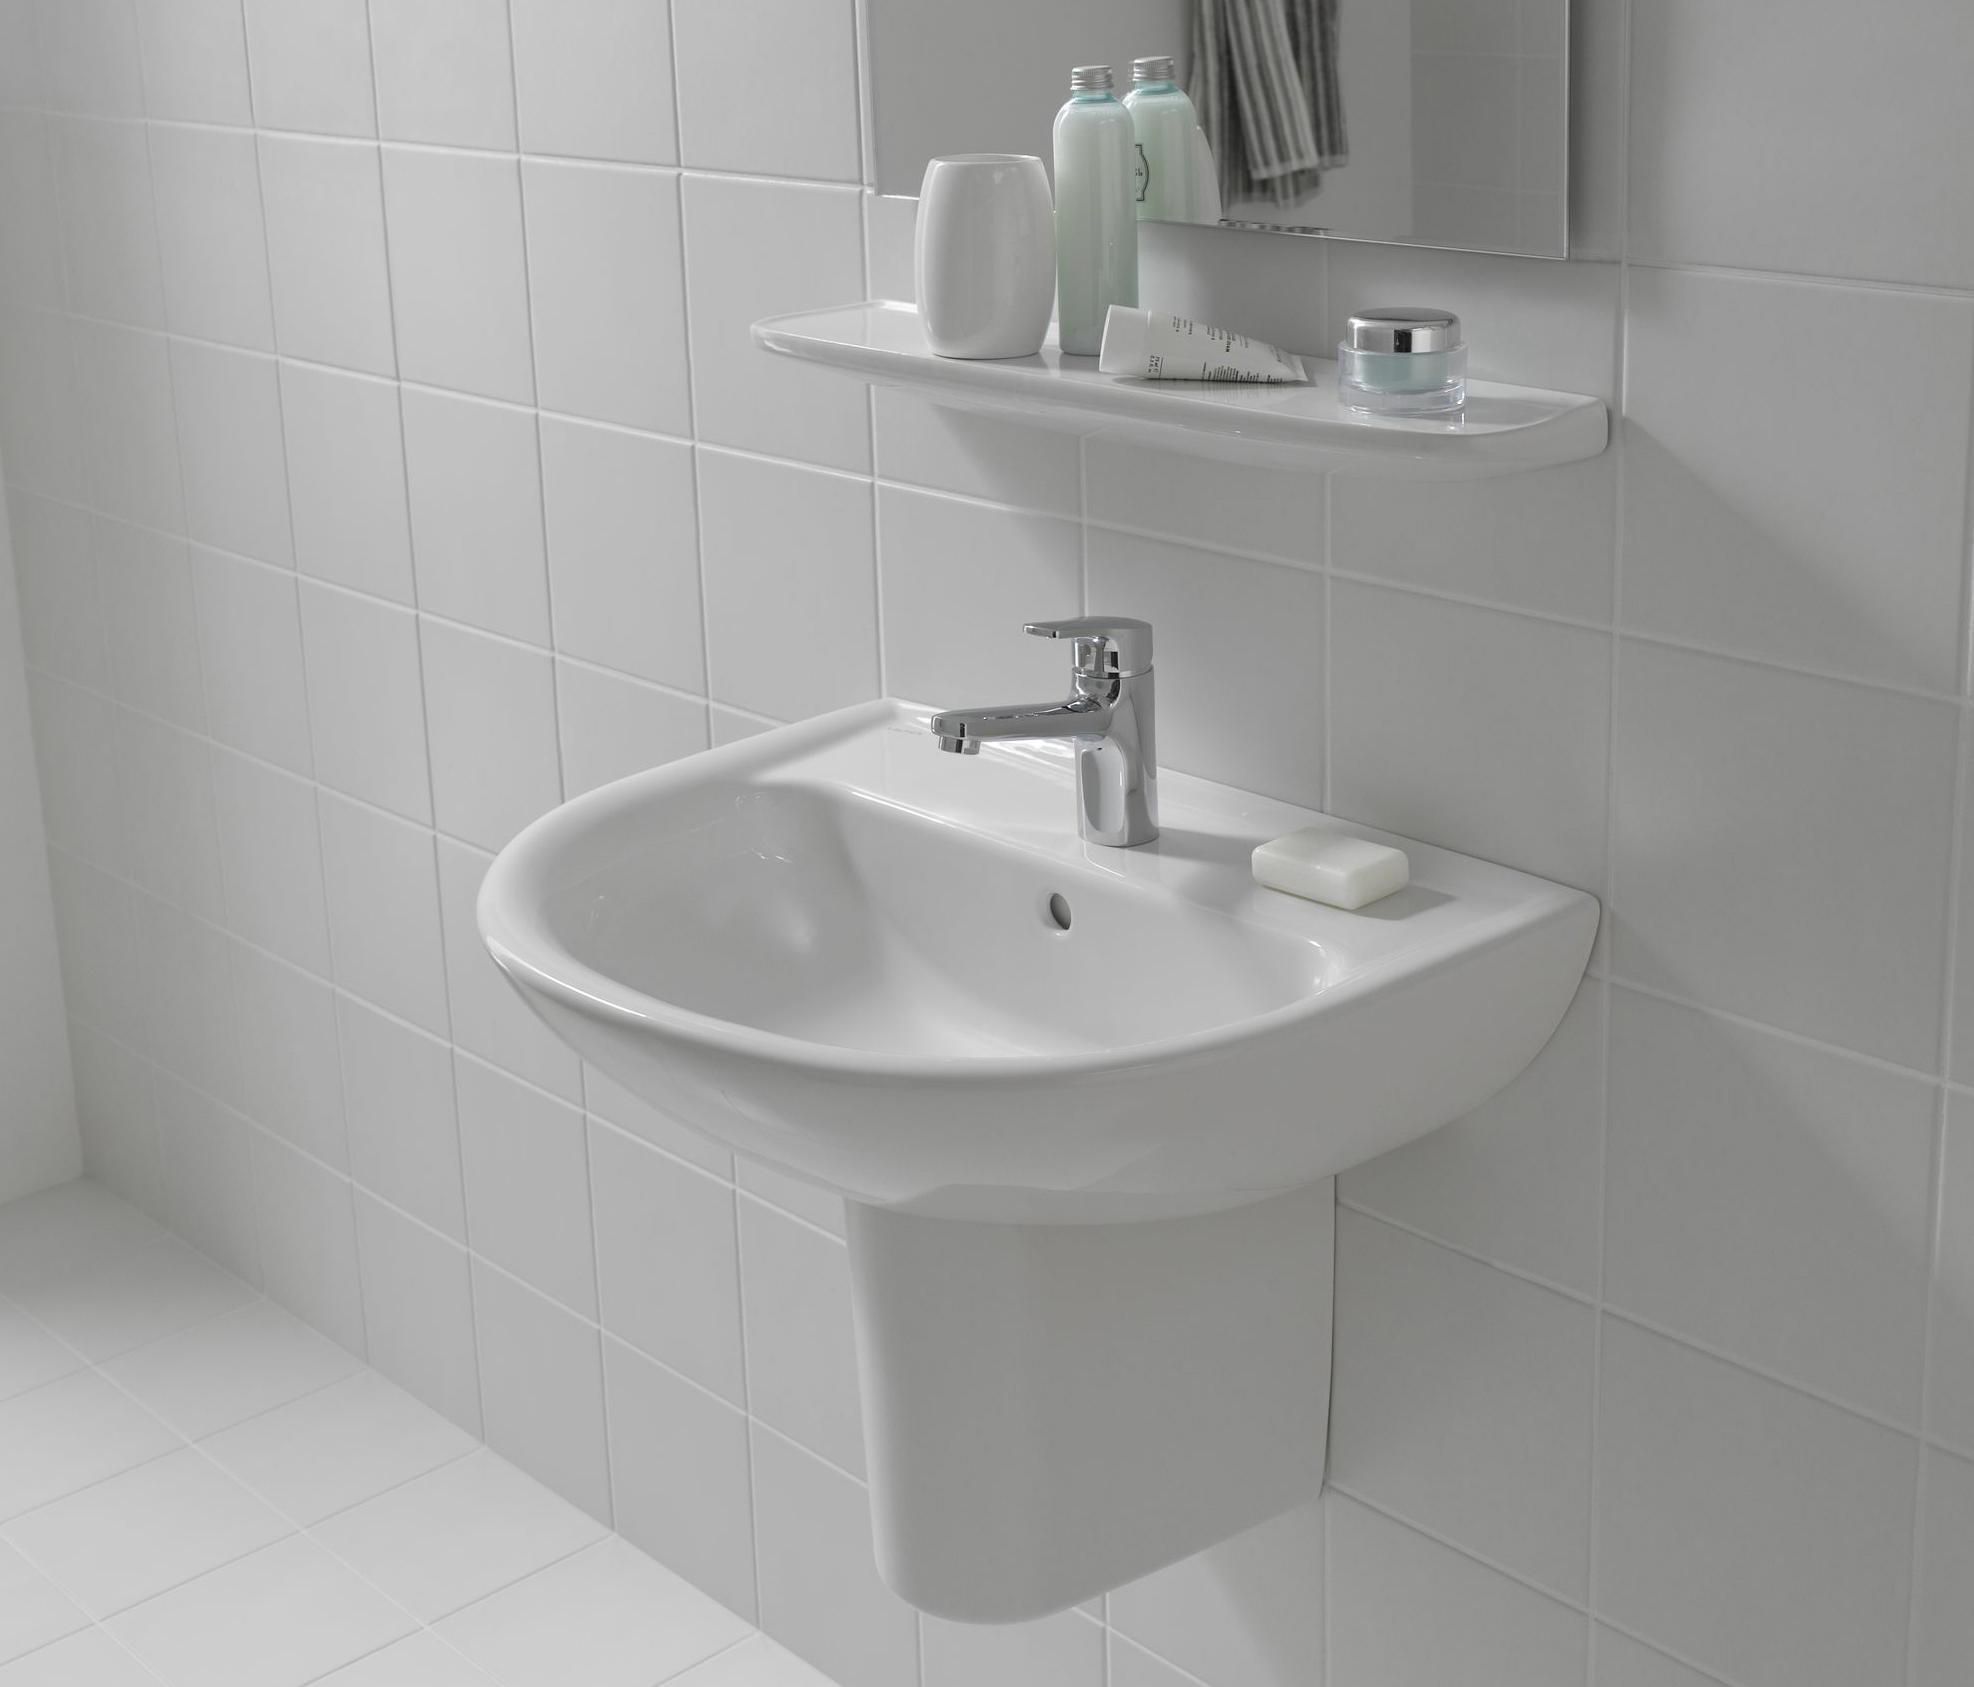 laufen pro b small washbasin wash basins from laufen architonic. Black Bedroom Furniture Sets. Home Design Ideas